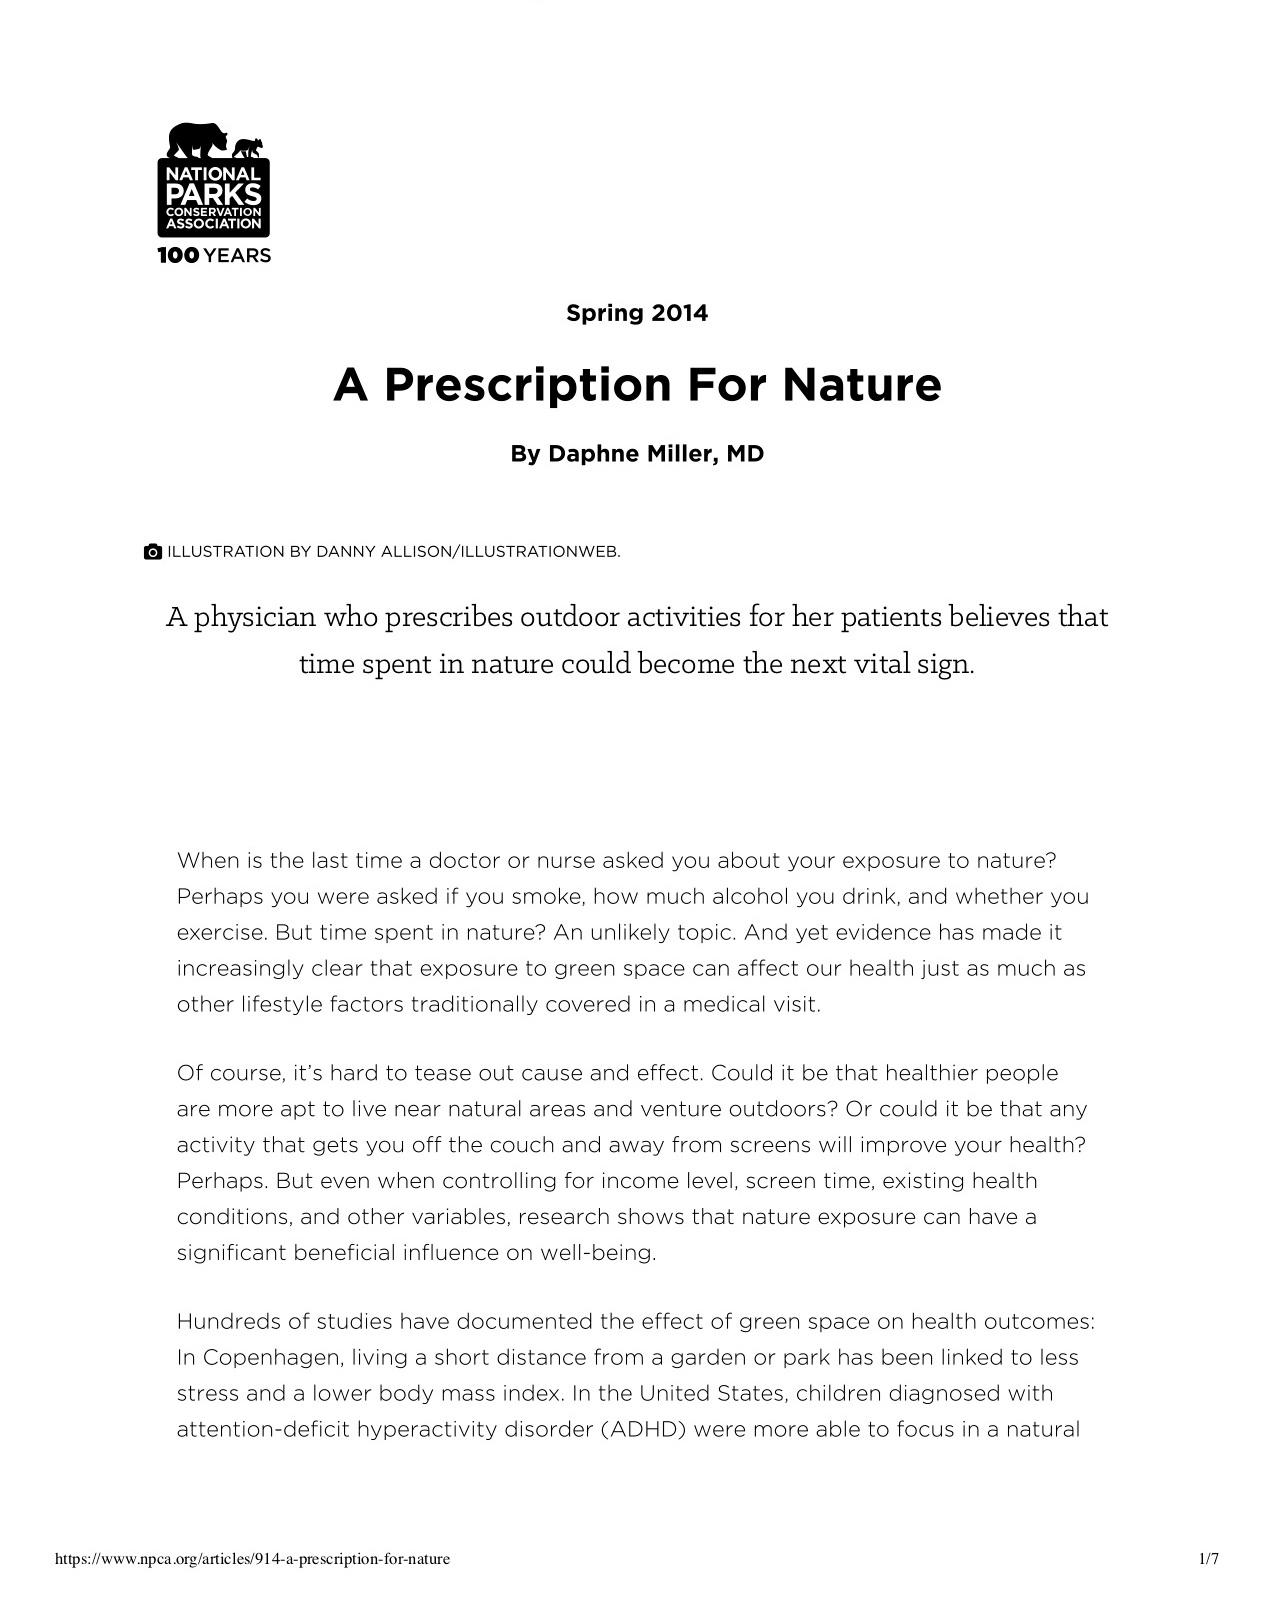 A+Prescription+For+Nature+%C2%B7+National+Parks+Conservation+Association.jpg